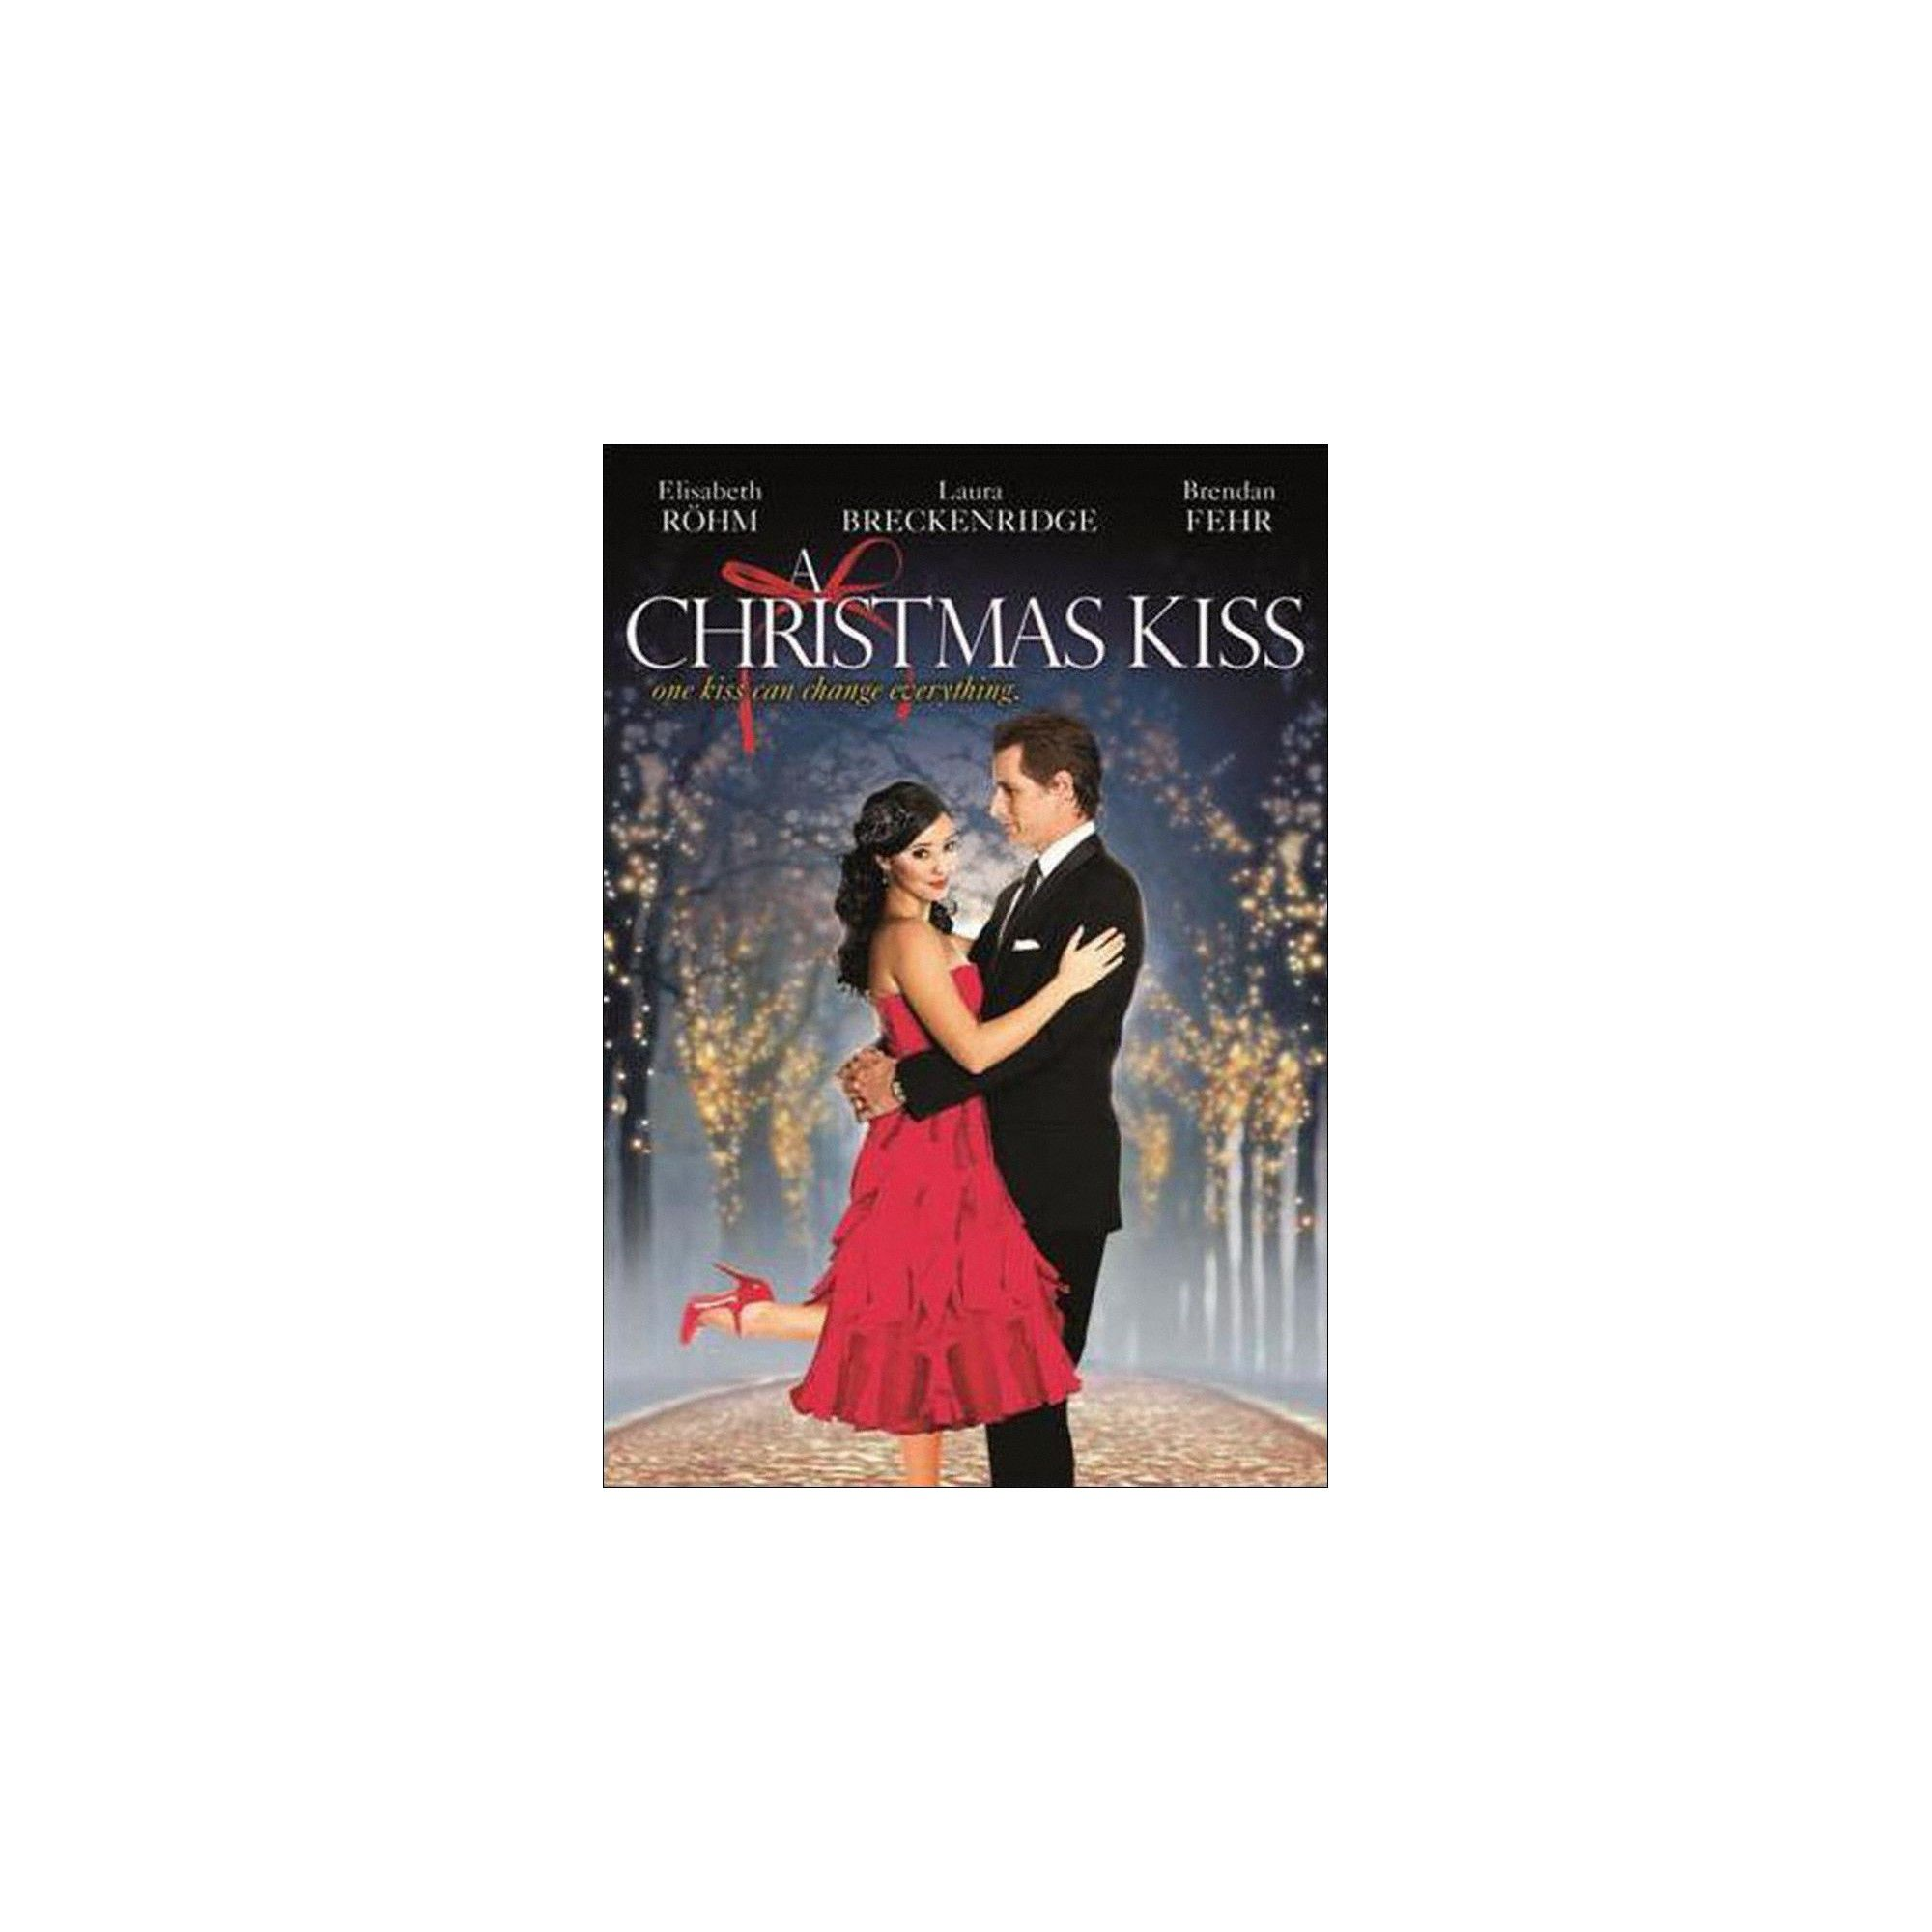 A Christmas Kiss Dvd Christmas Kiss Brendan Fehr Dvd